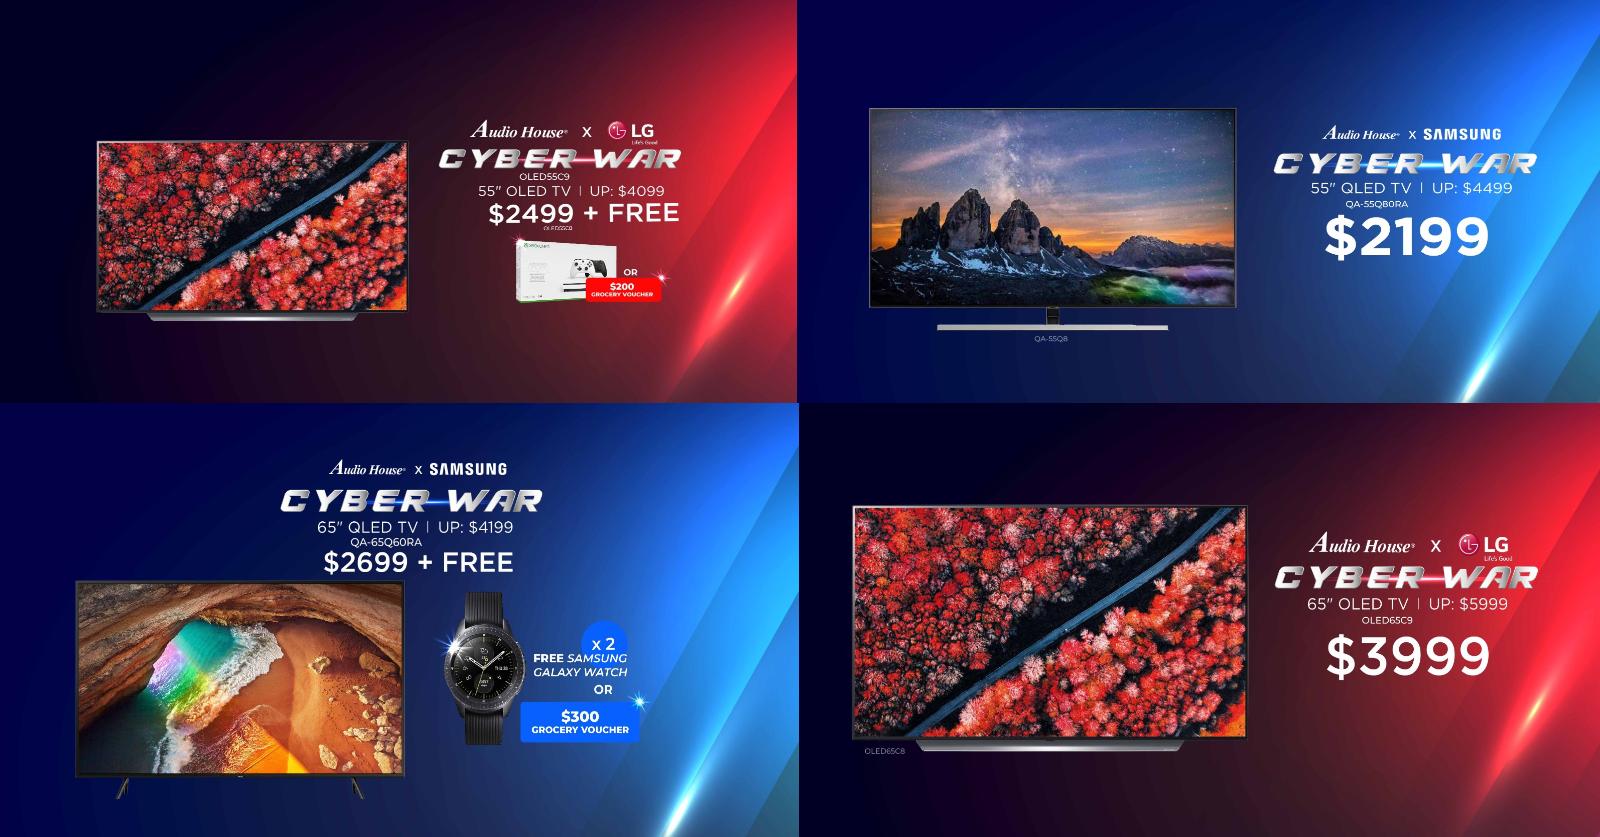 Audio House TV Cyber War: Samsung vs LG, QLED vs OLED